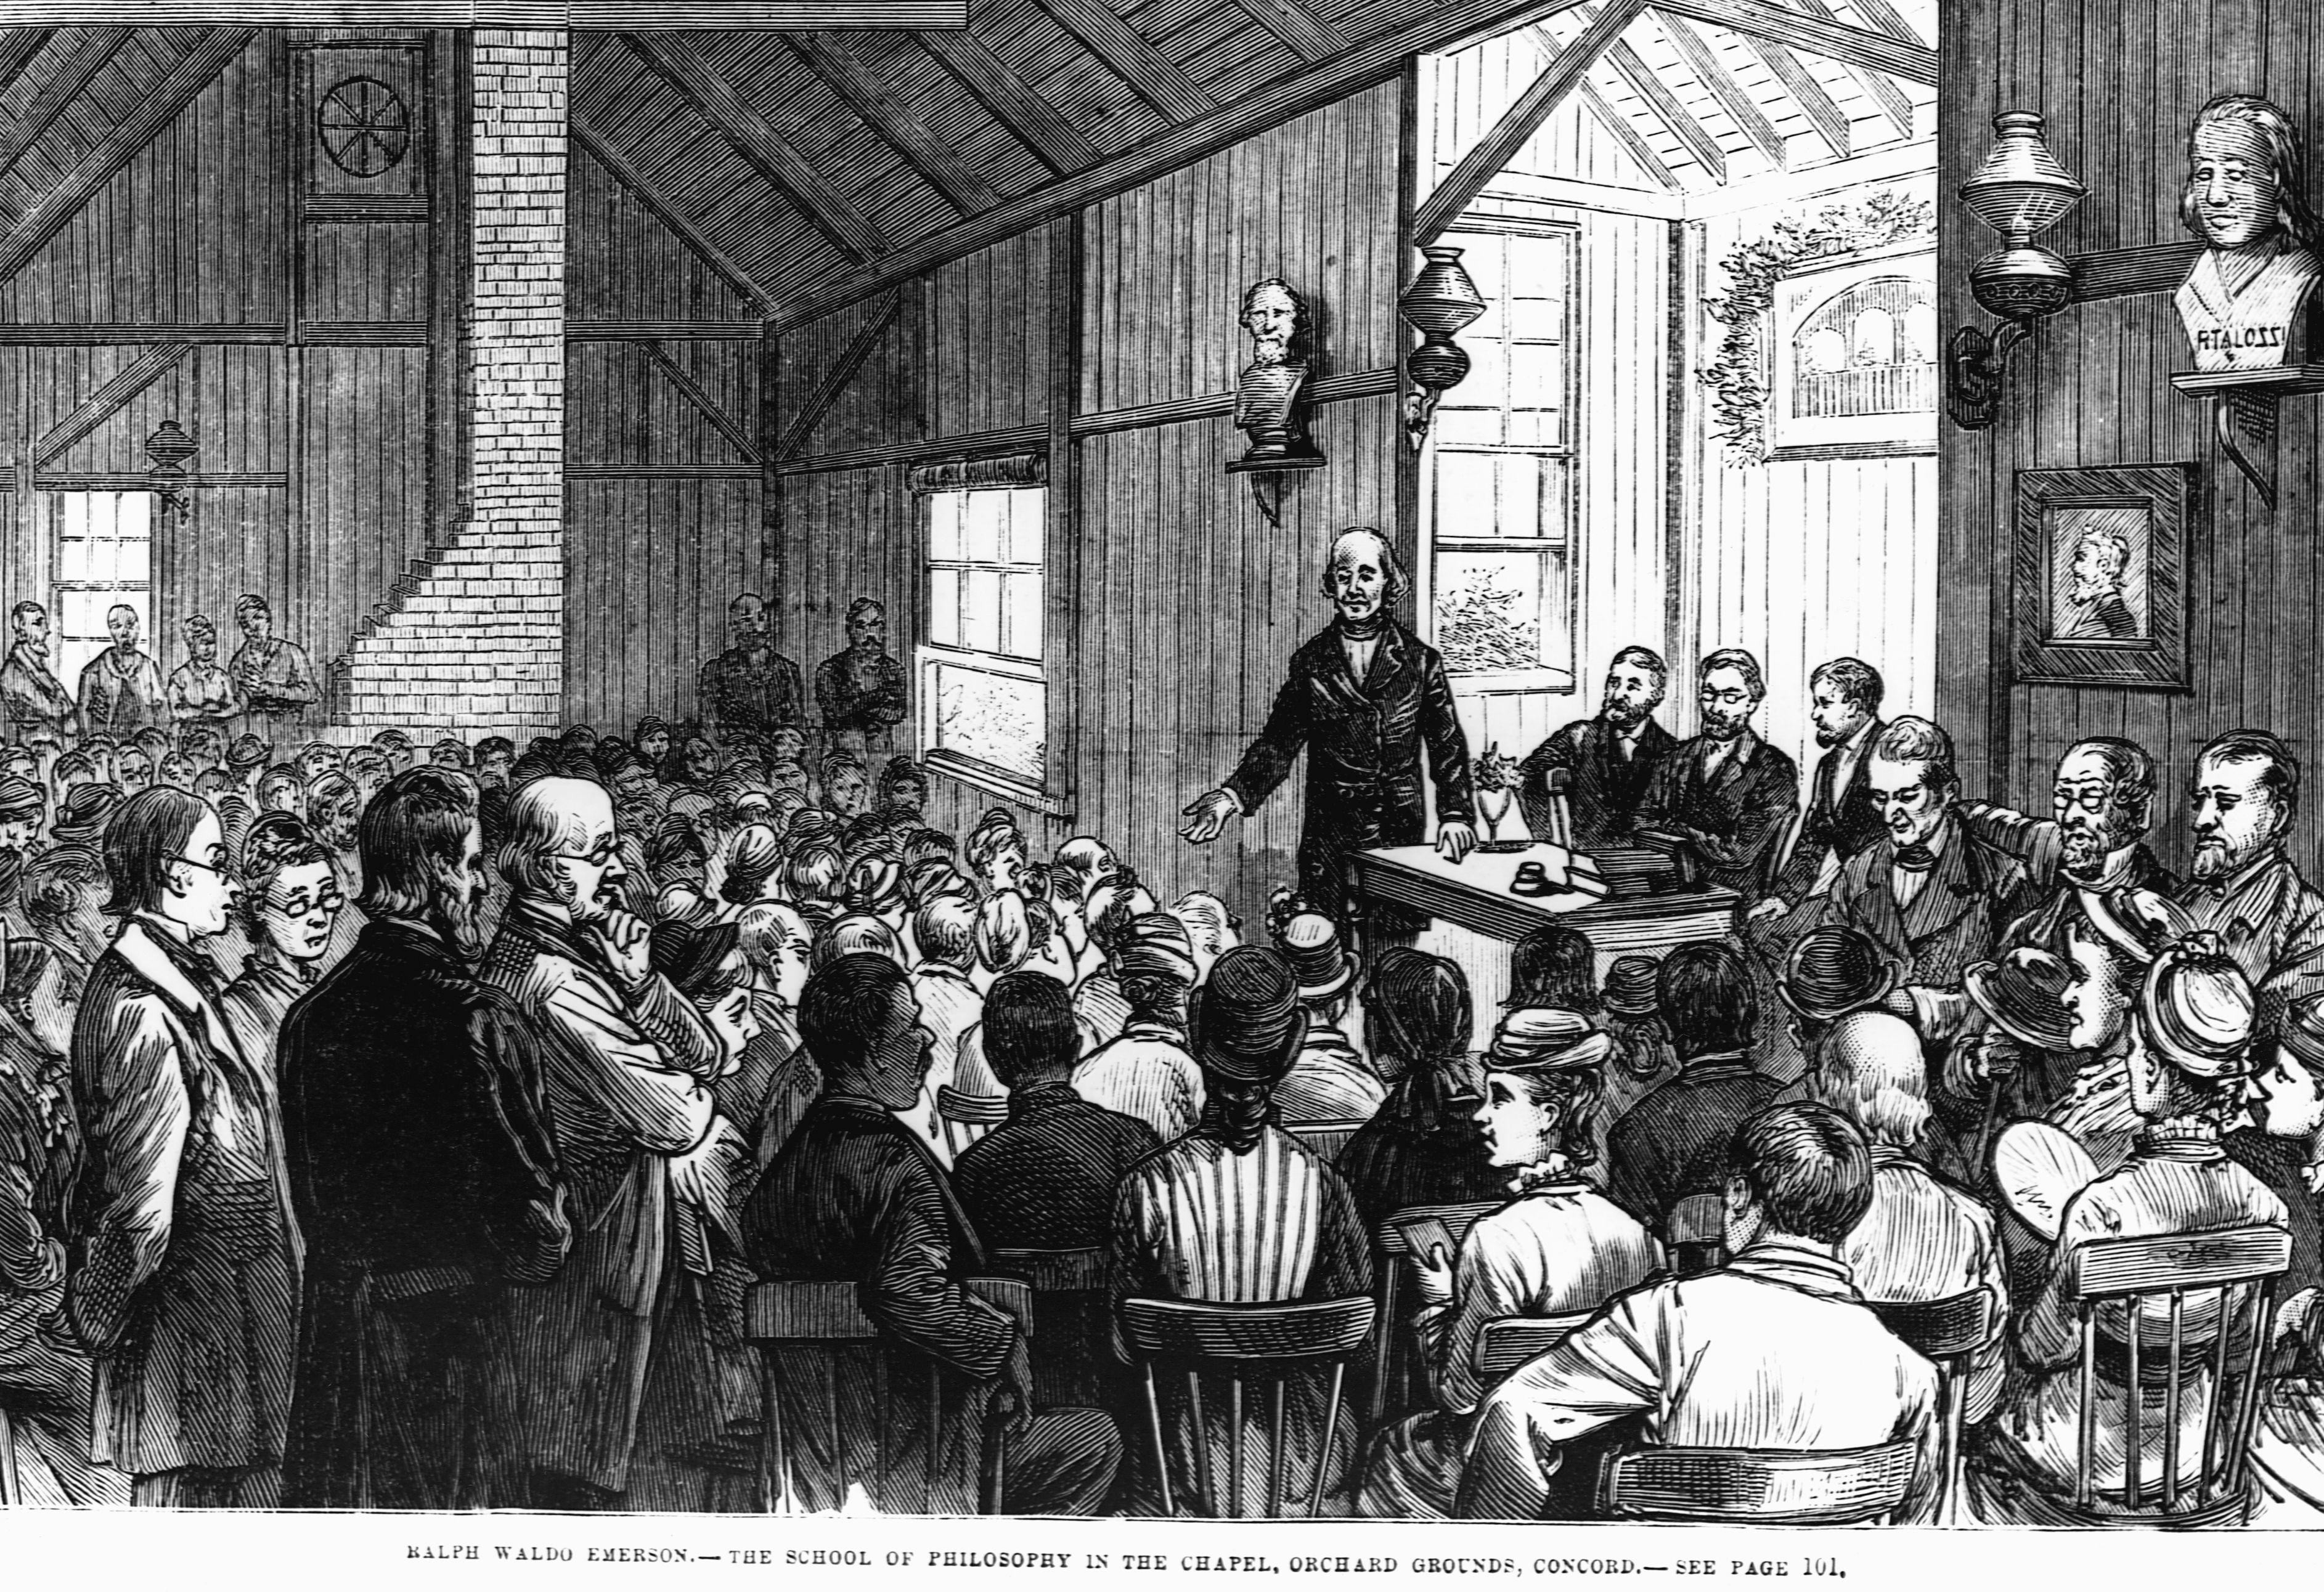 Ralph Waldo Emerson speaking in public